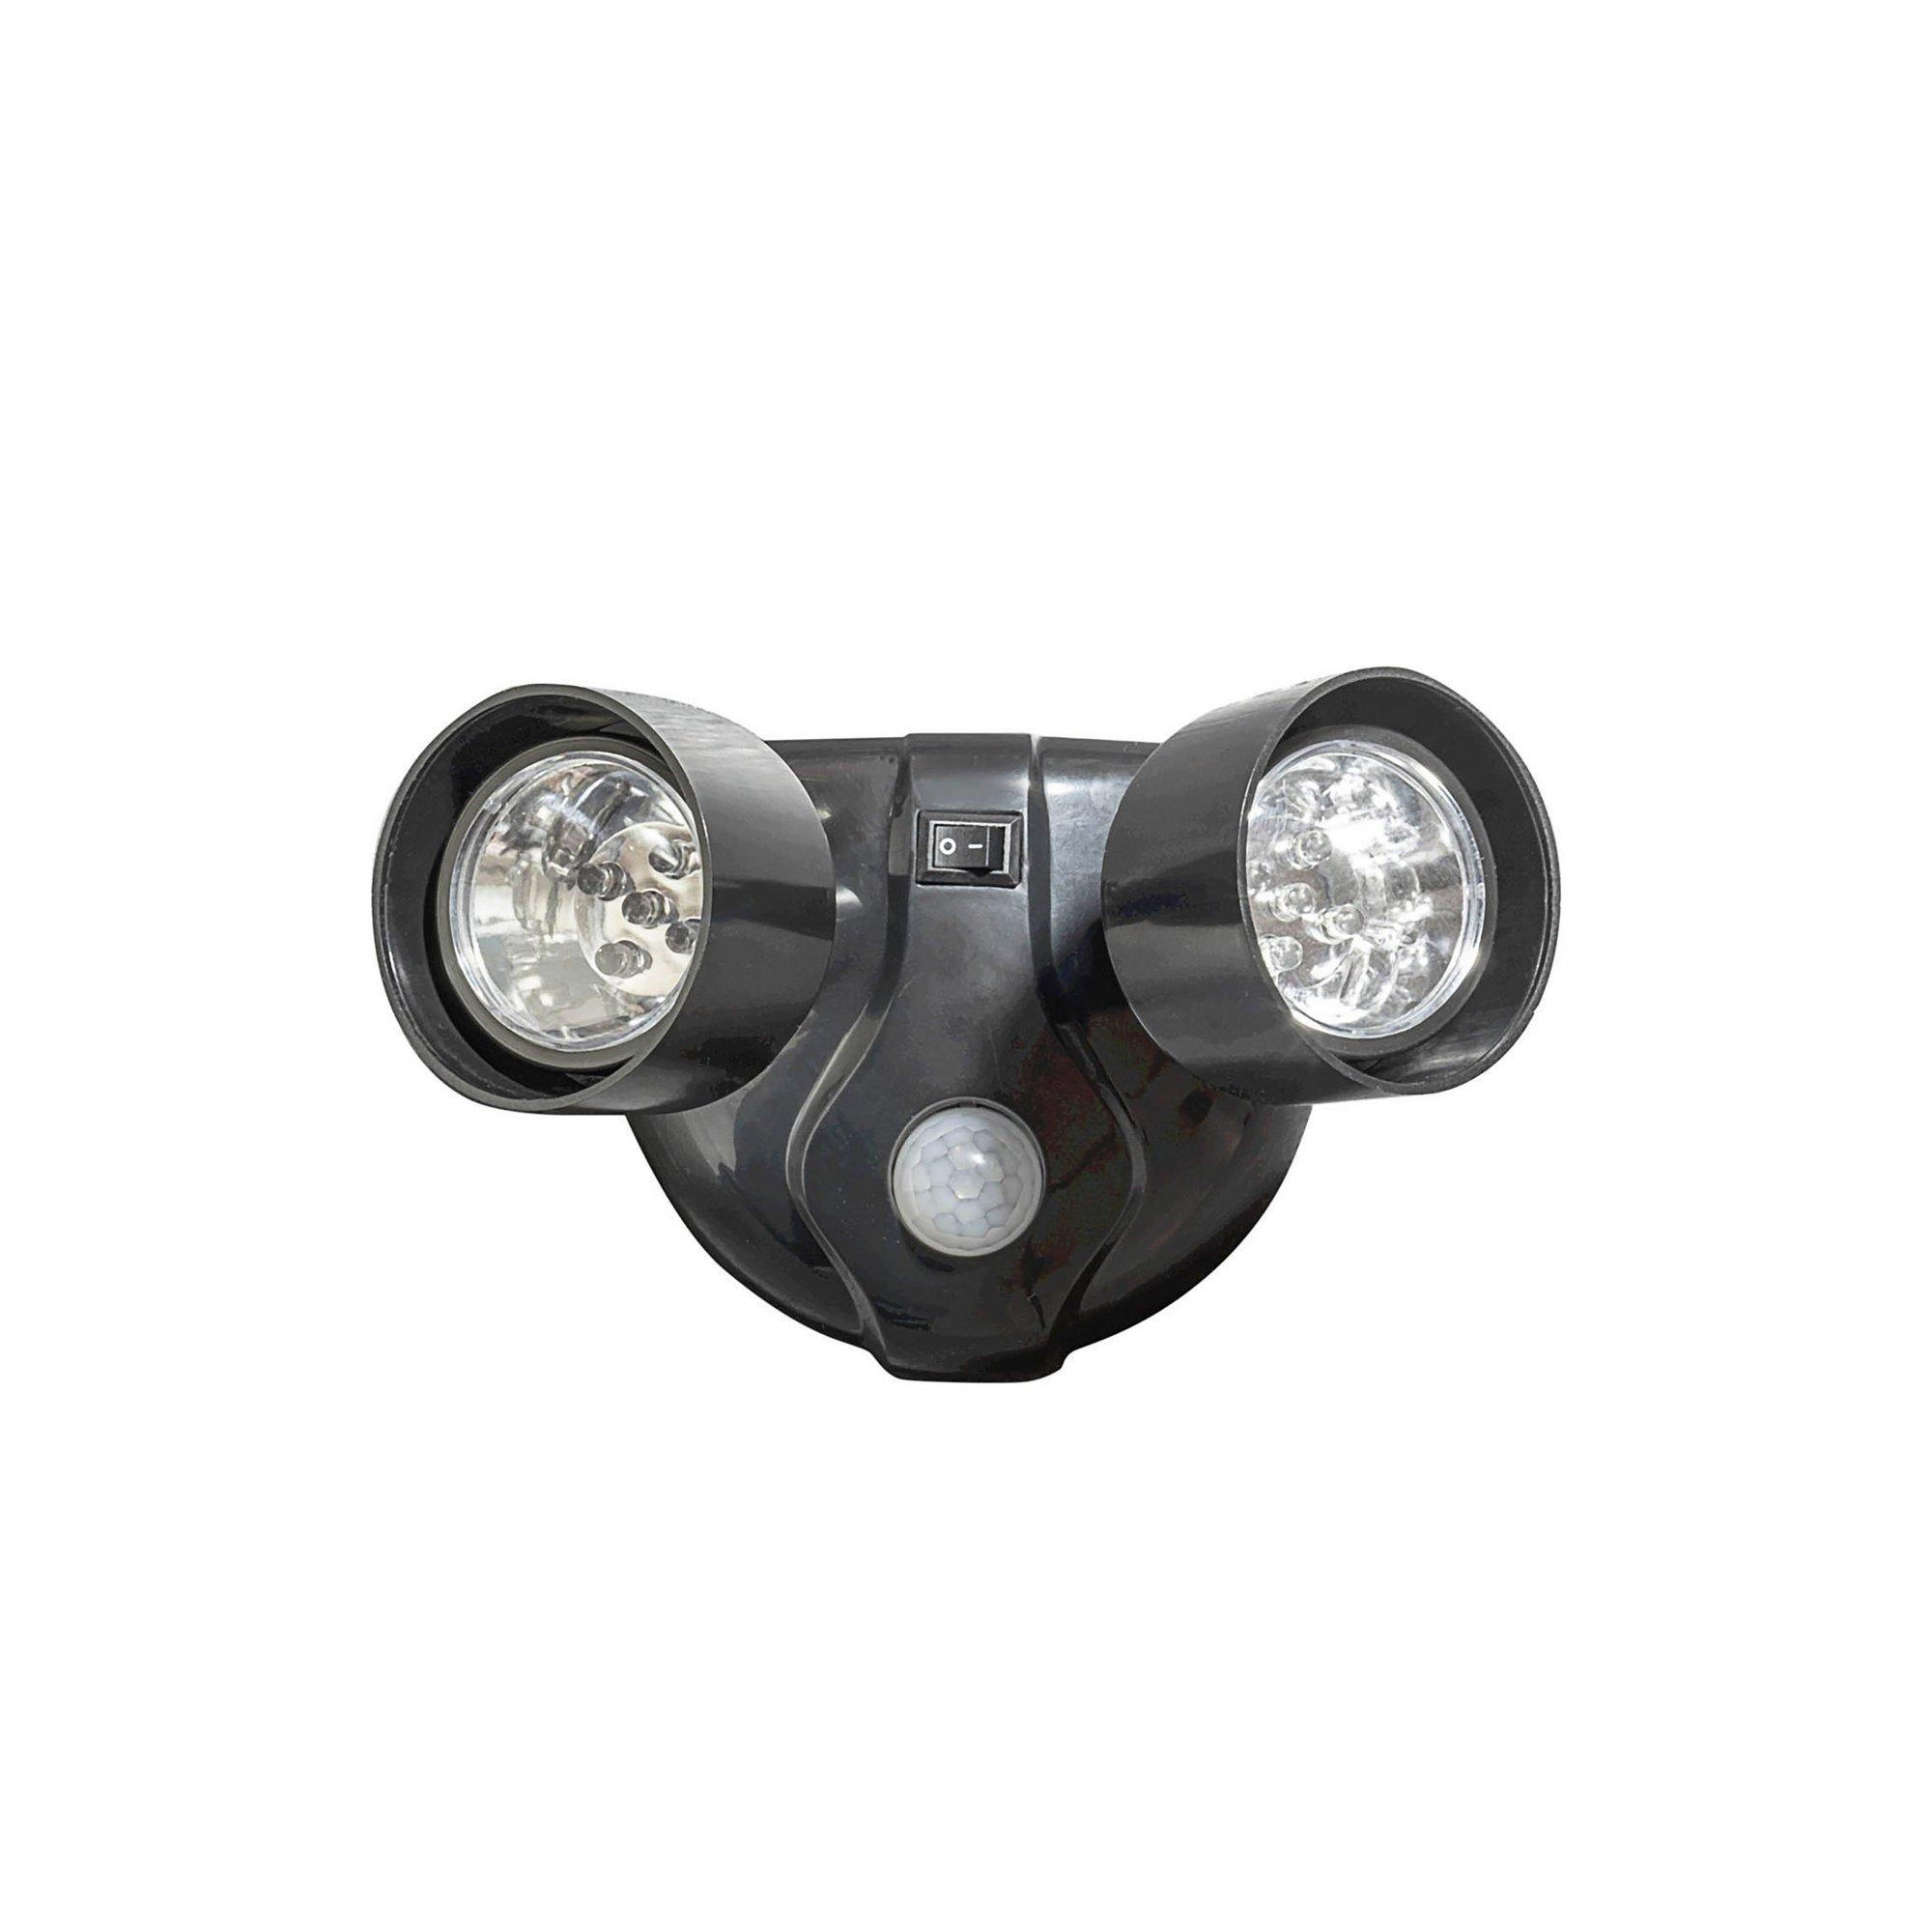 Image of 5 LED Twin Head Motion Sensor Security Battery Light